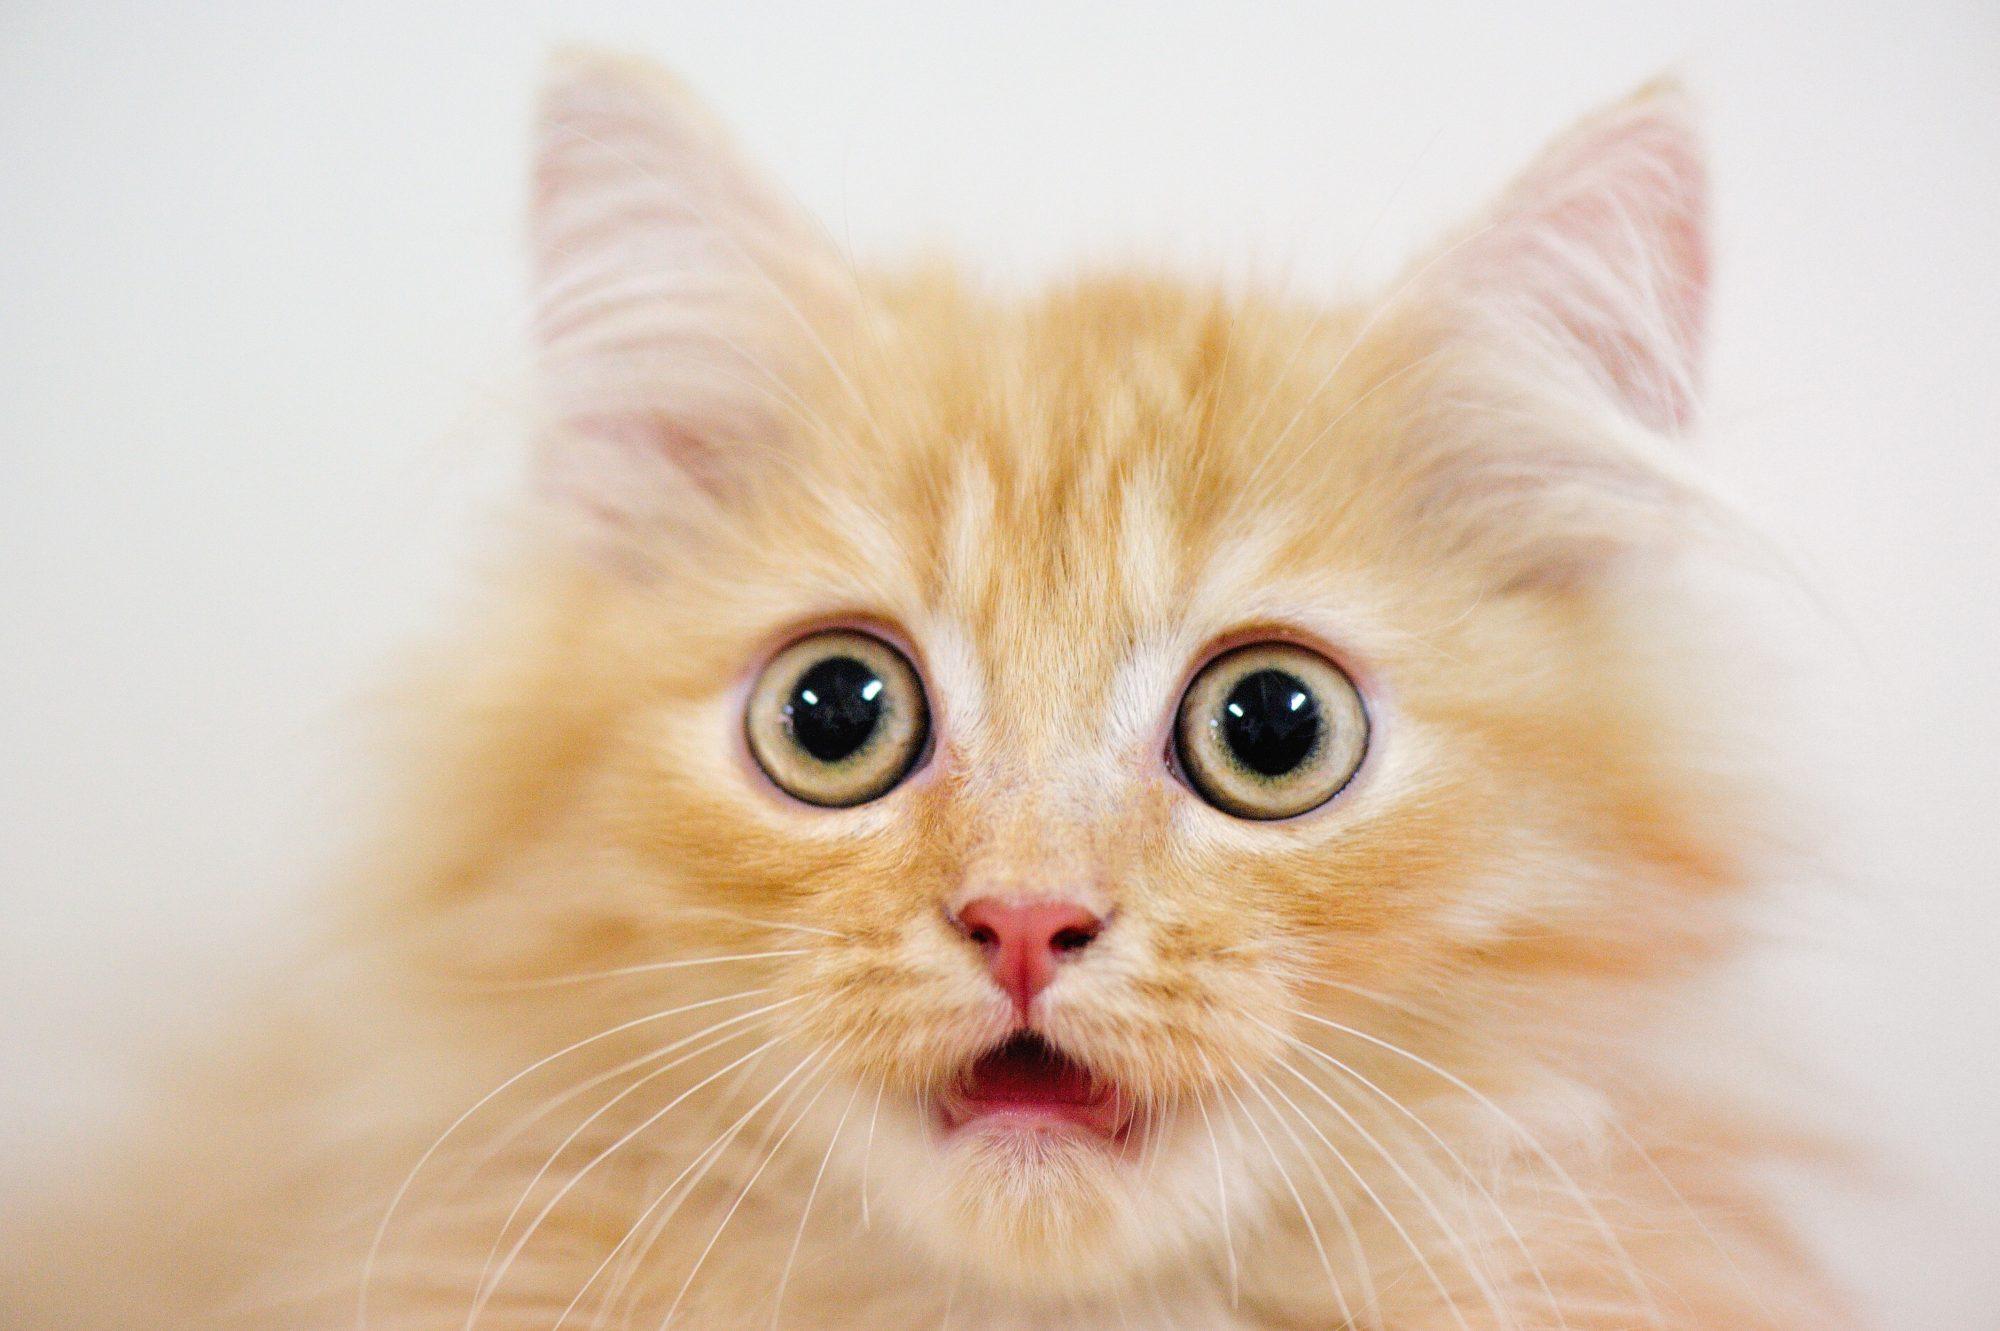 Scared cat Getty 8/4/20